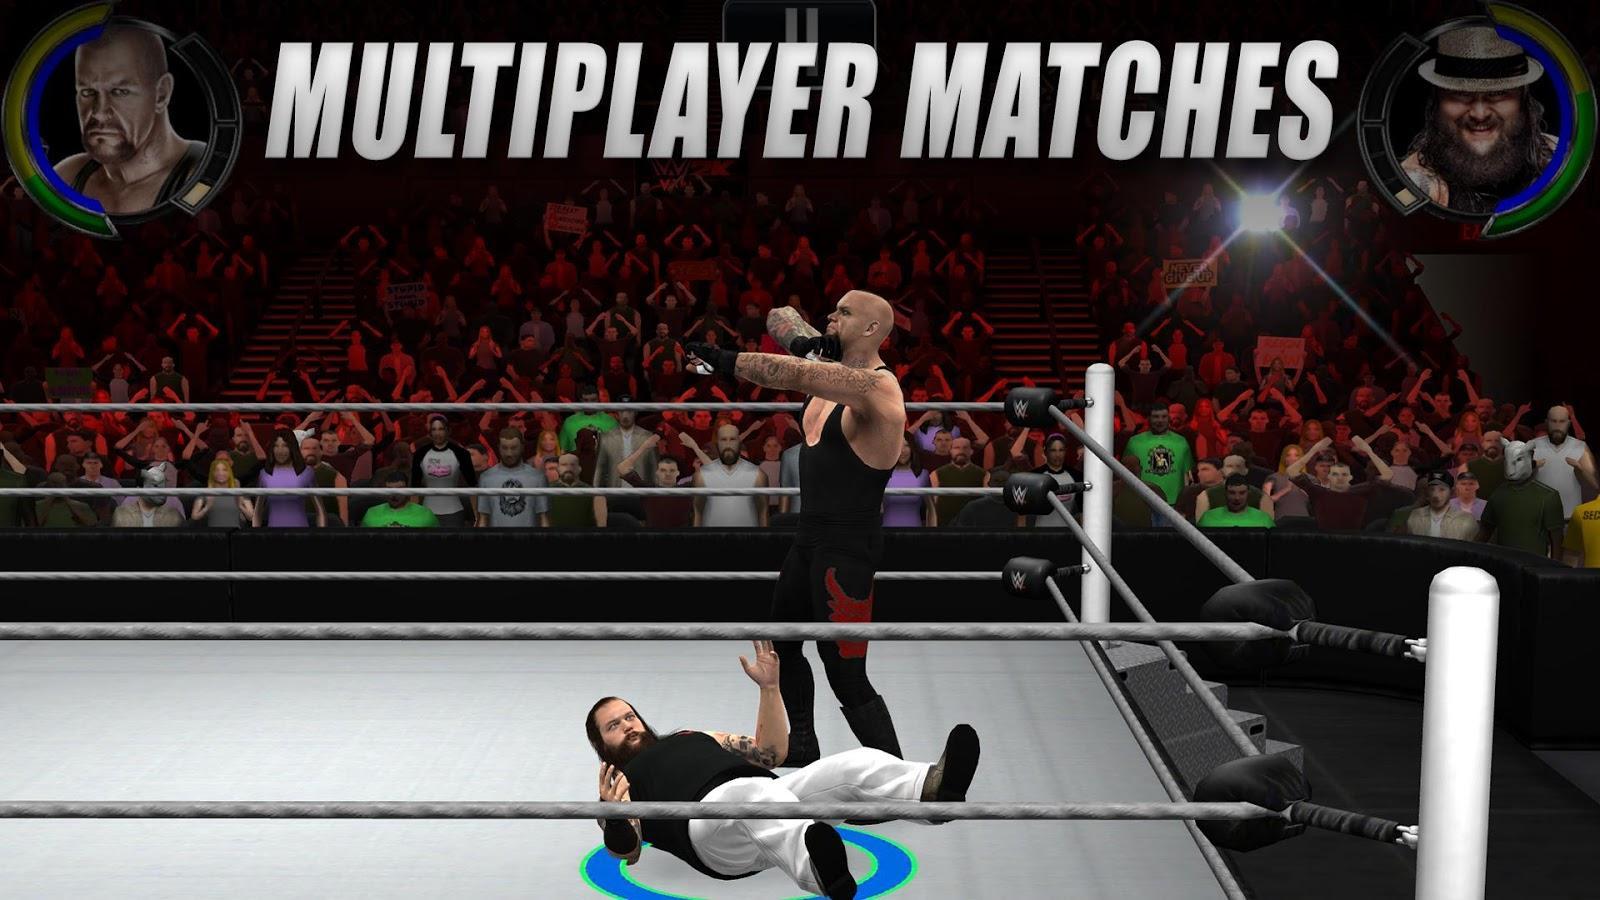 WWE 2K (MOD APK, Paid/Unlocked) v1.1.8117 2